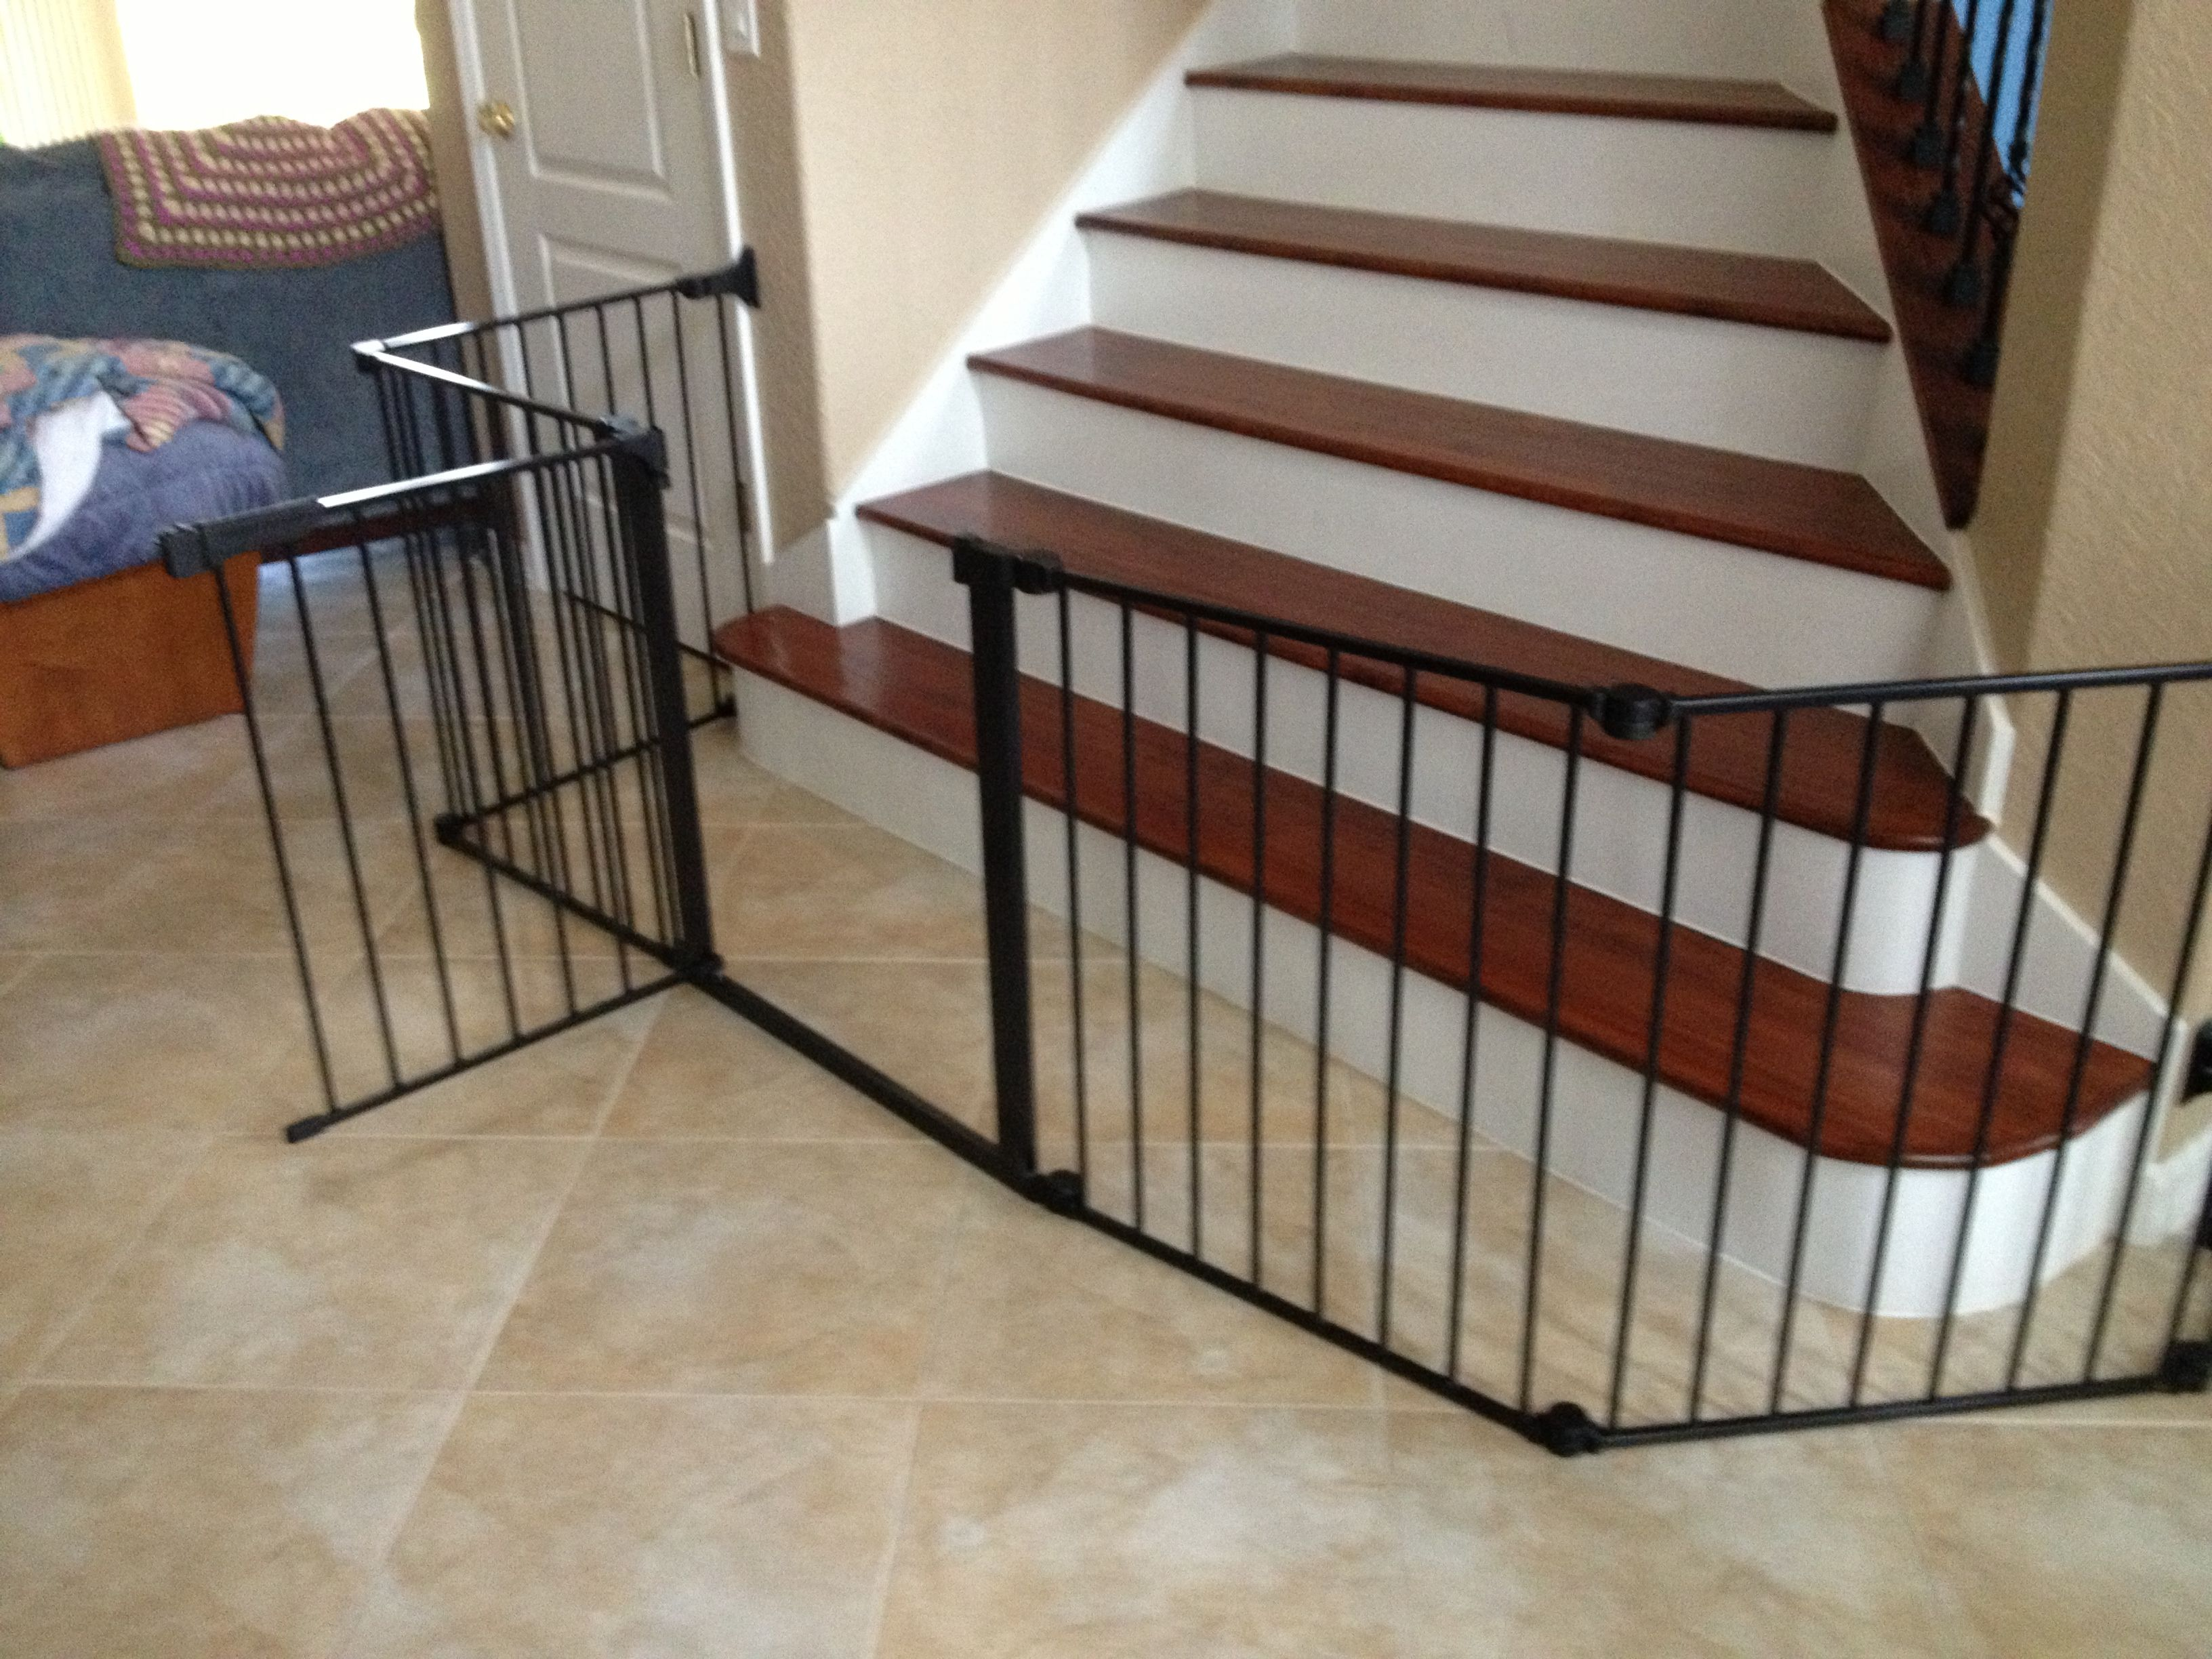 1000 Ideas About Ba Gates Stairs On Pinterest Ba Gates ...